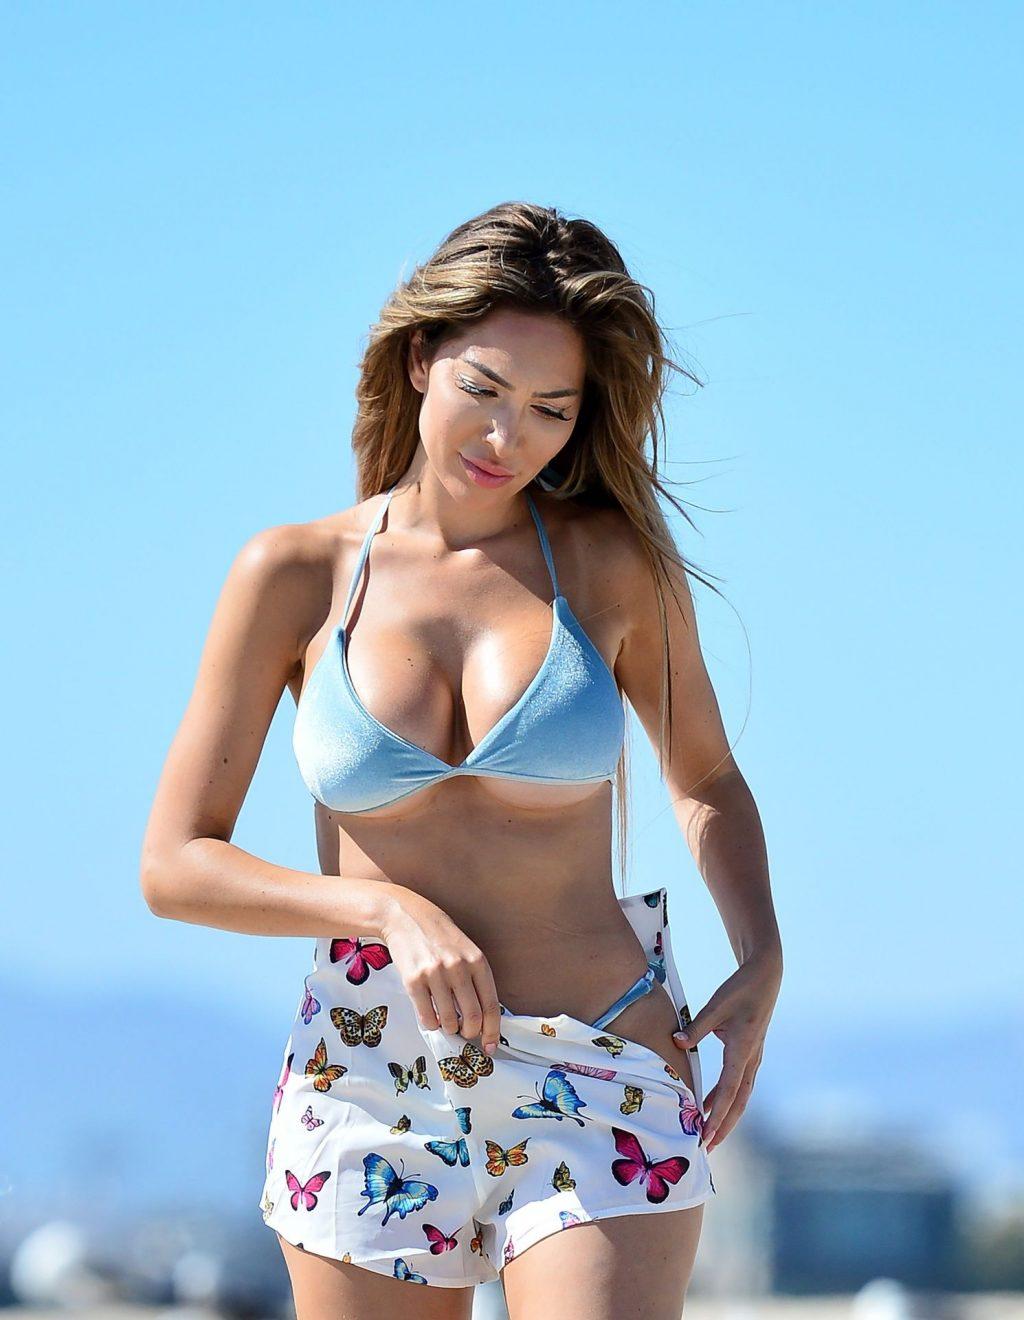 Farrah Abraham Flaunts Her Amazing Bikini Body at the Beach (64 Photos)